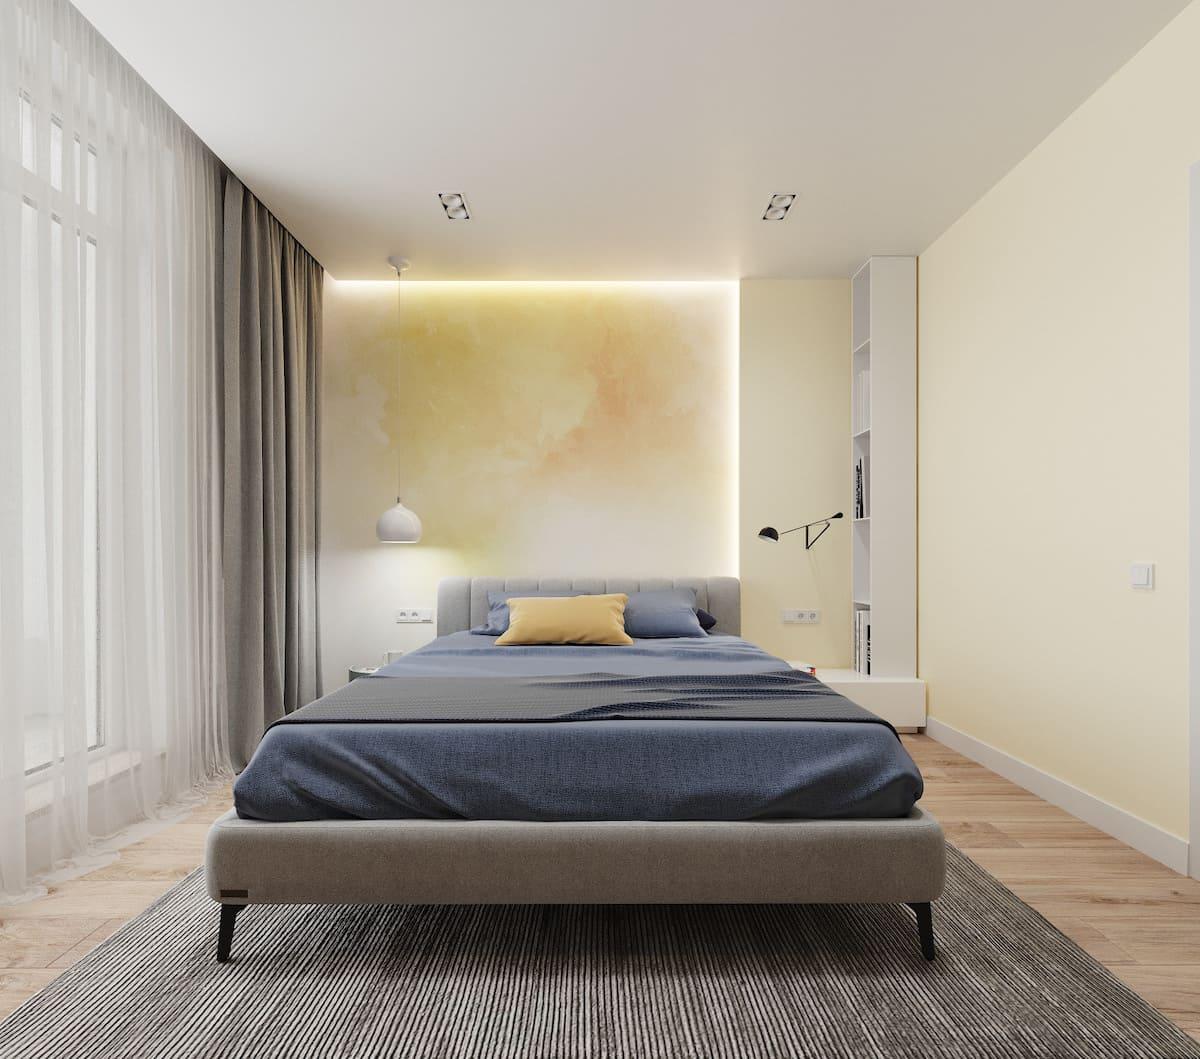 дизайн интерьера модной квартиры фото 90